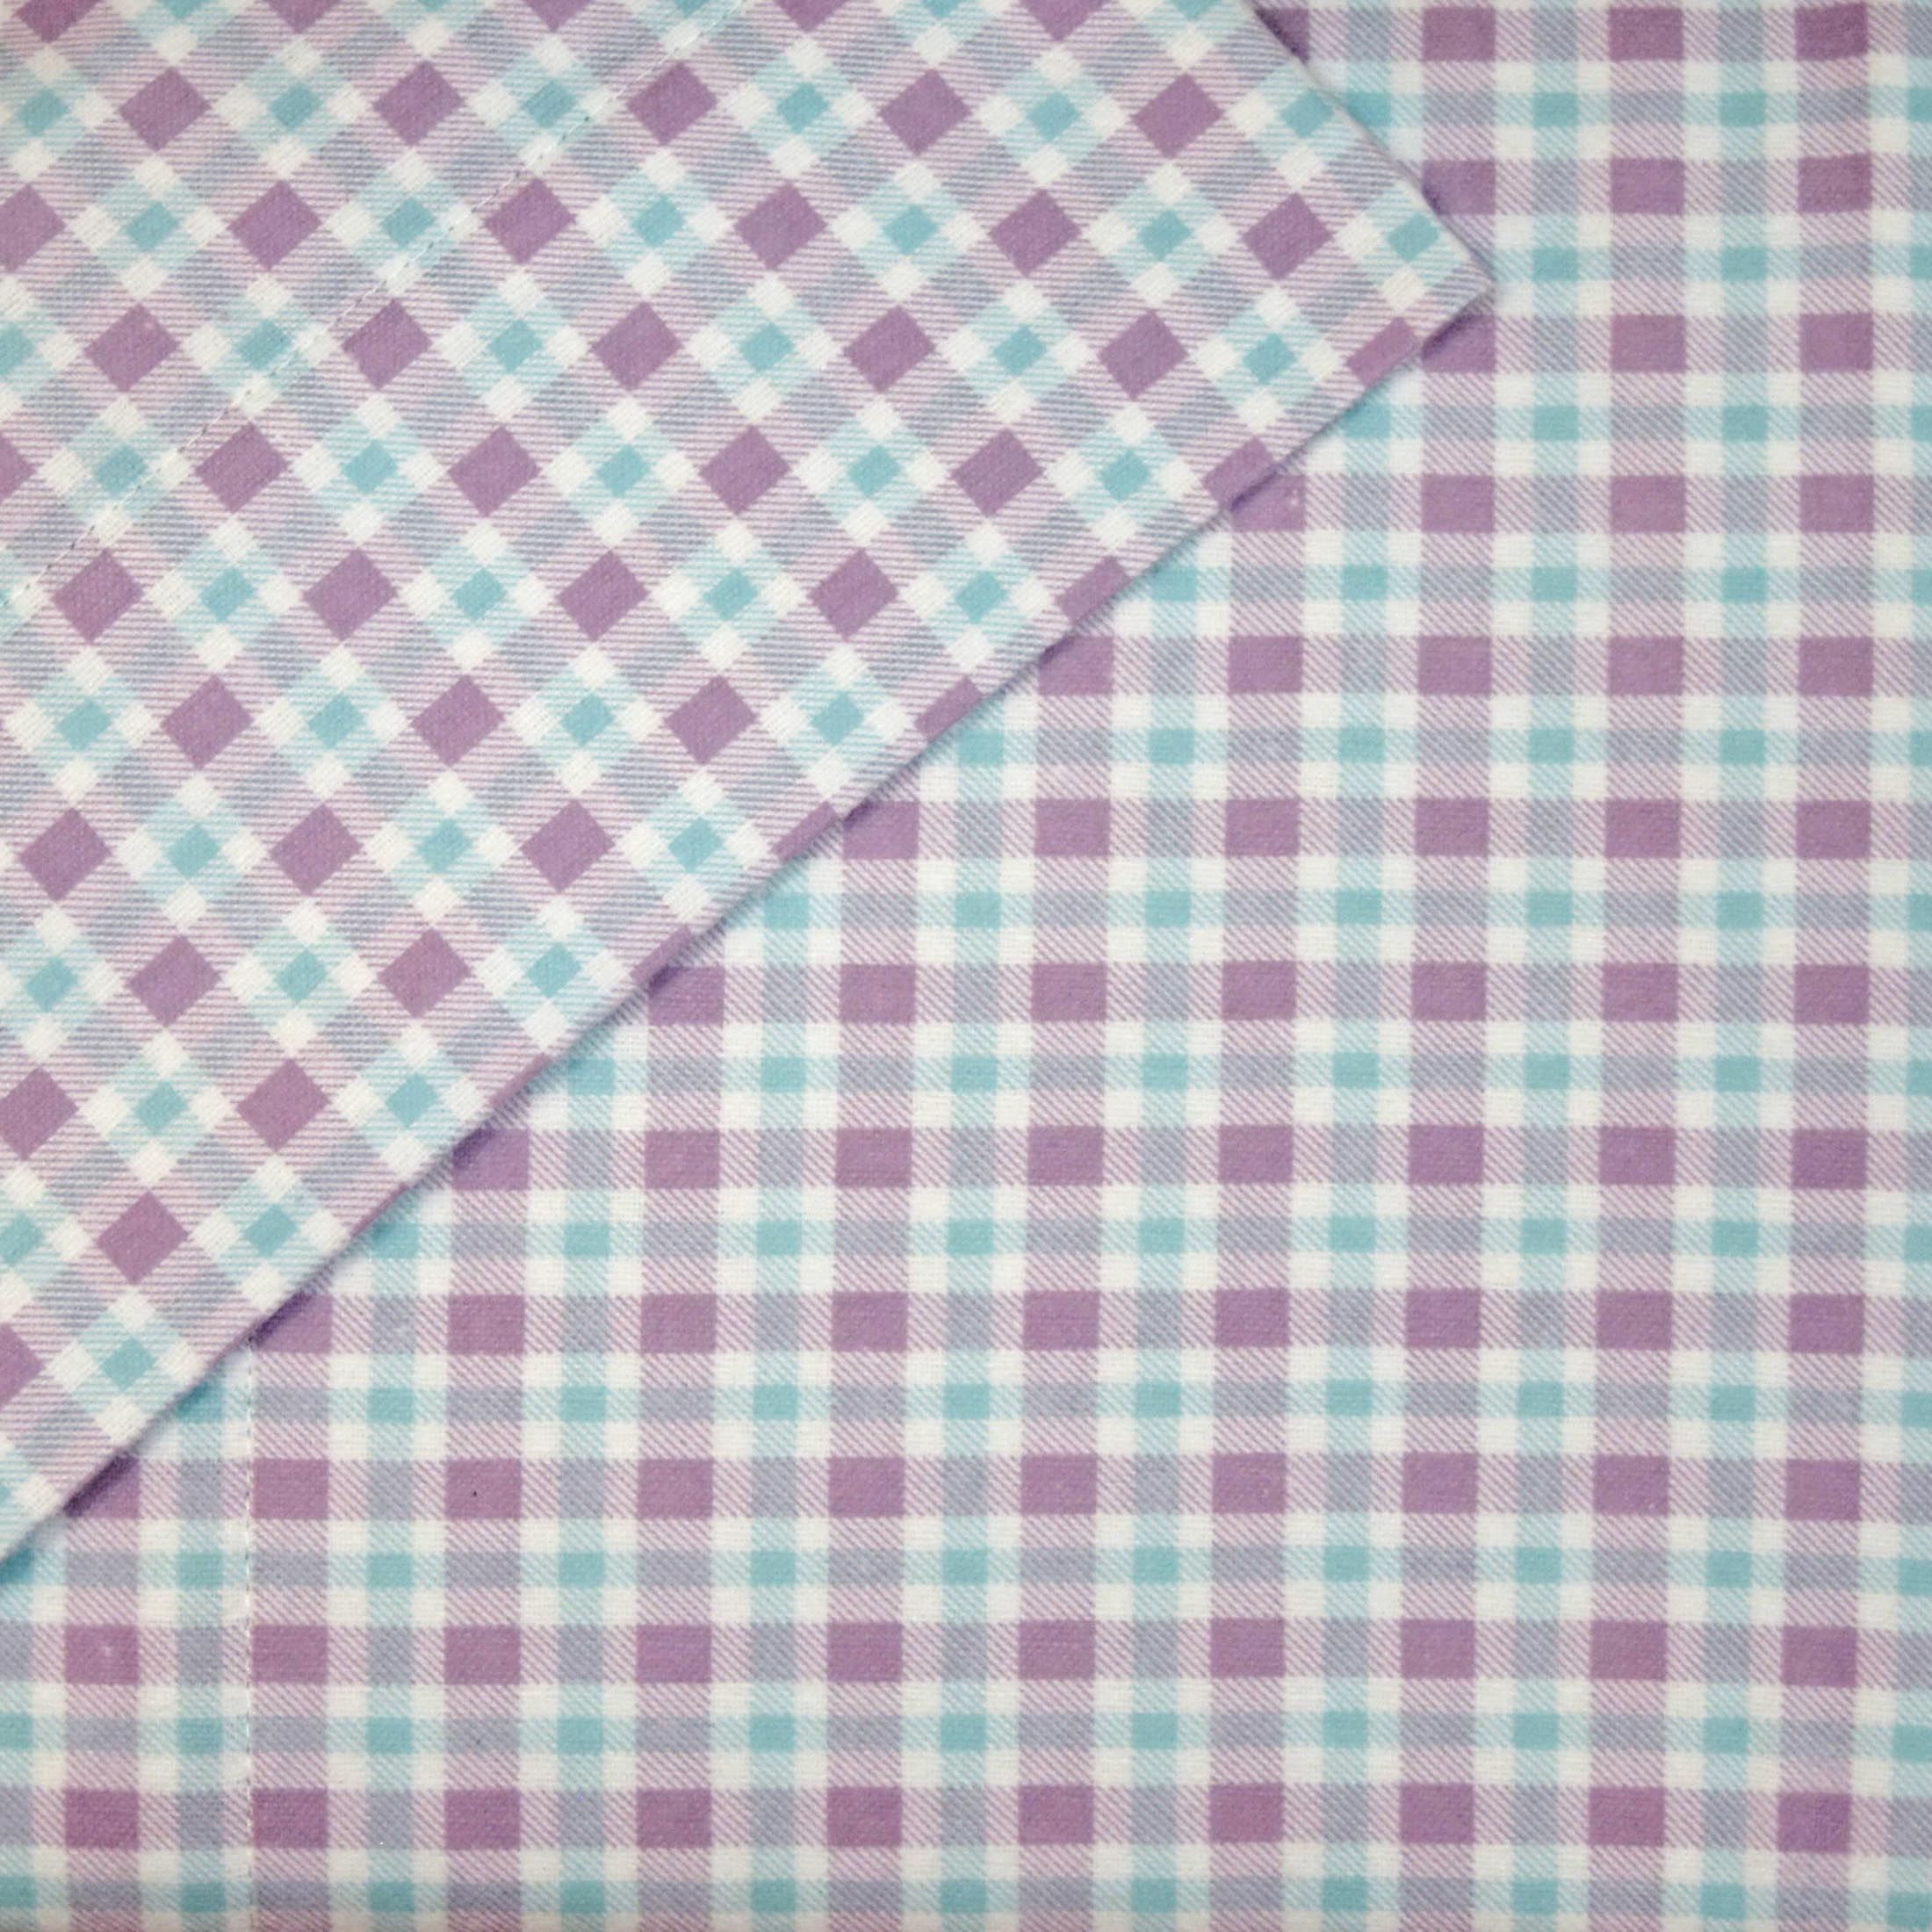 Cuddl Duds Full Flannel Sheet Set 4 Piece 100 Cotton Deep Pocket Heavyweight Double Bed Sheets Purple Blue Check Walmart Com Walmart Com